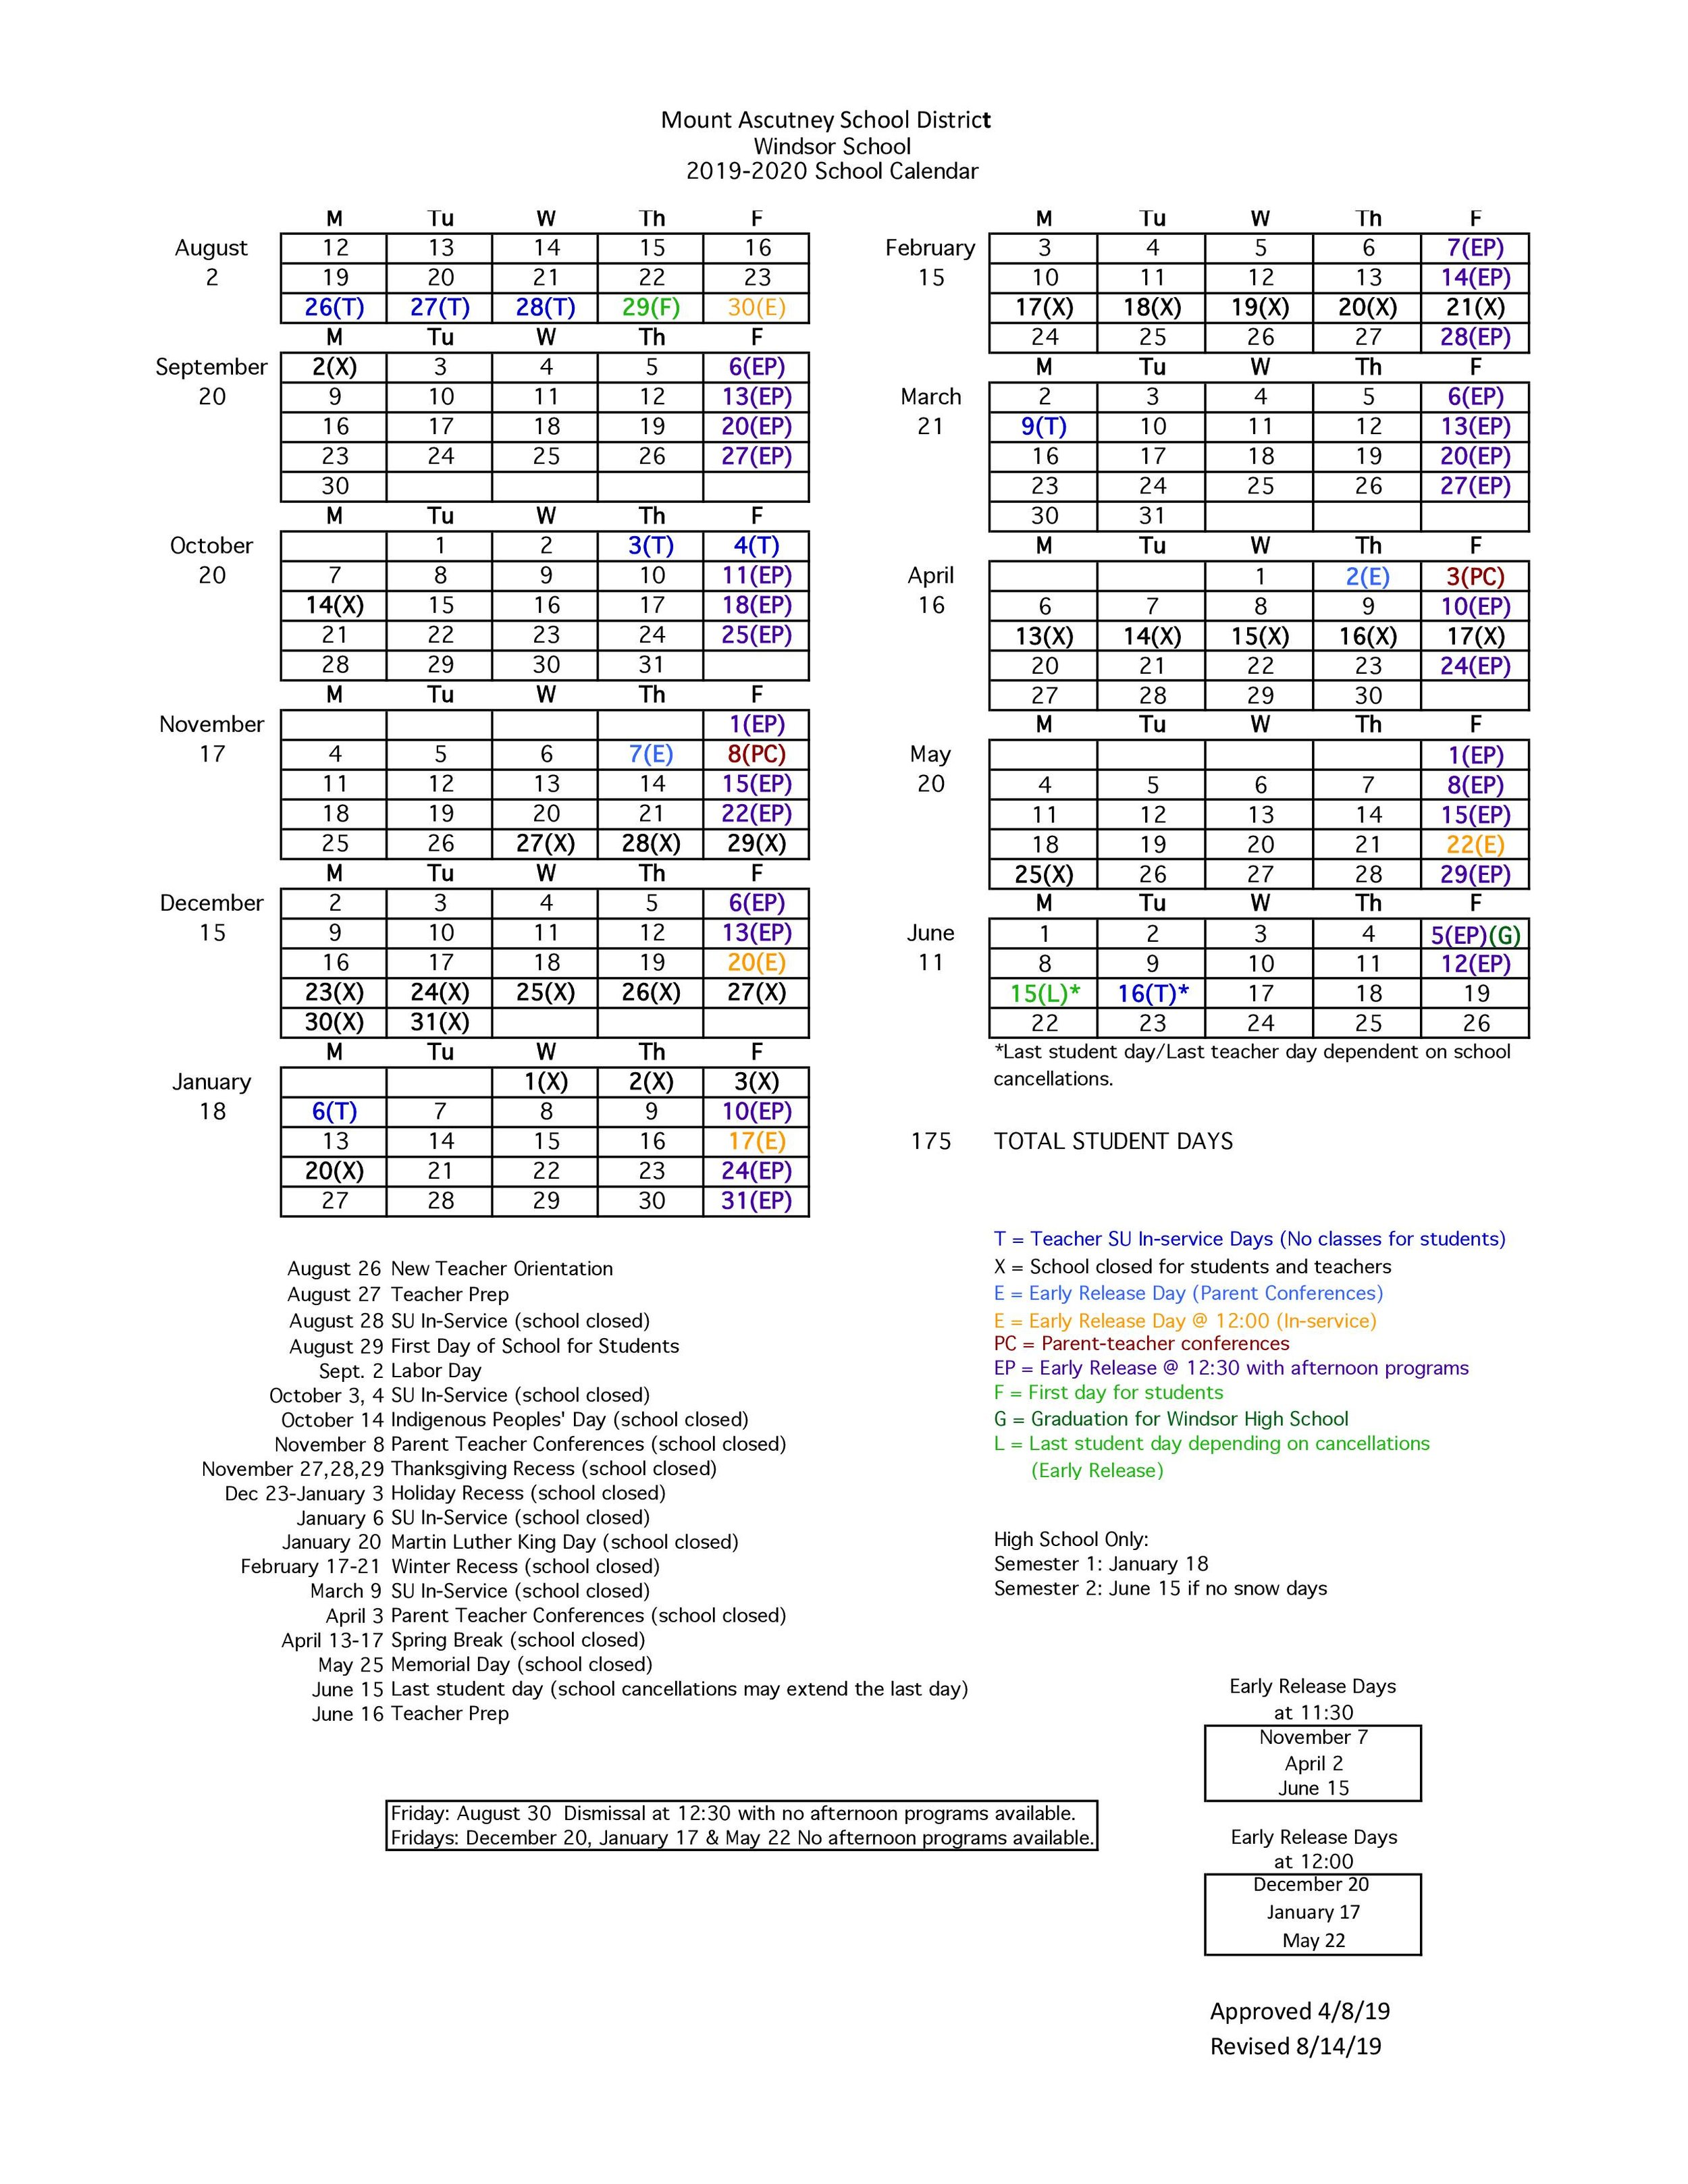 FY 2020 Windsor School Calendar final 1.jpg